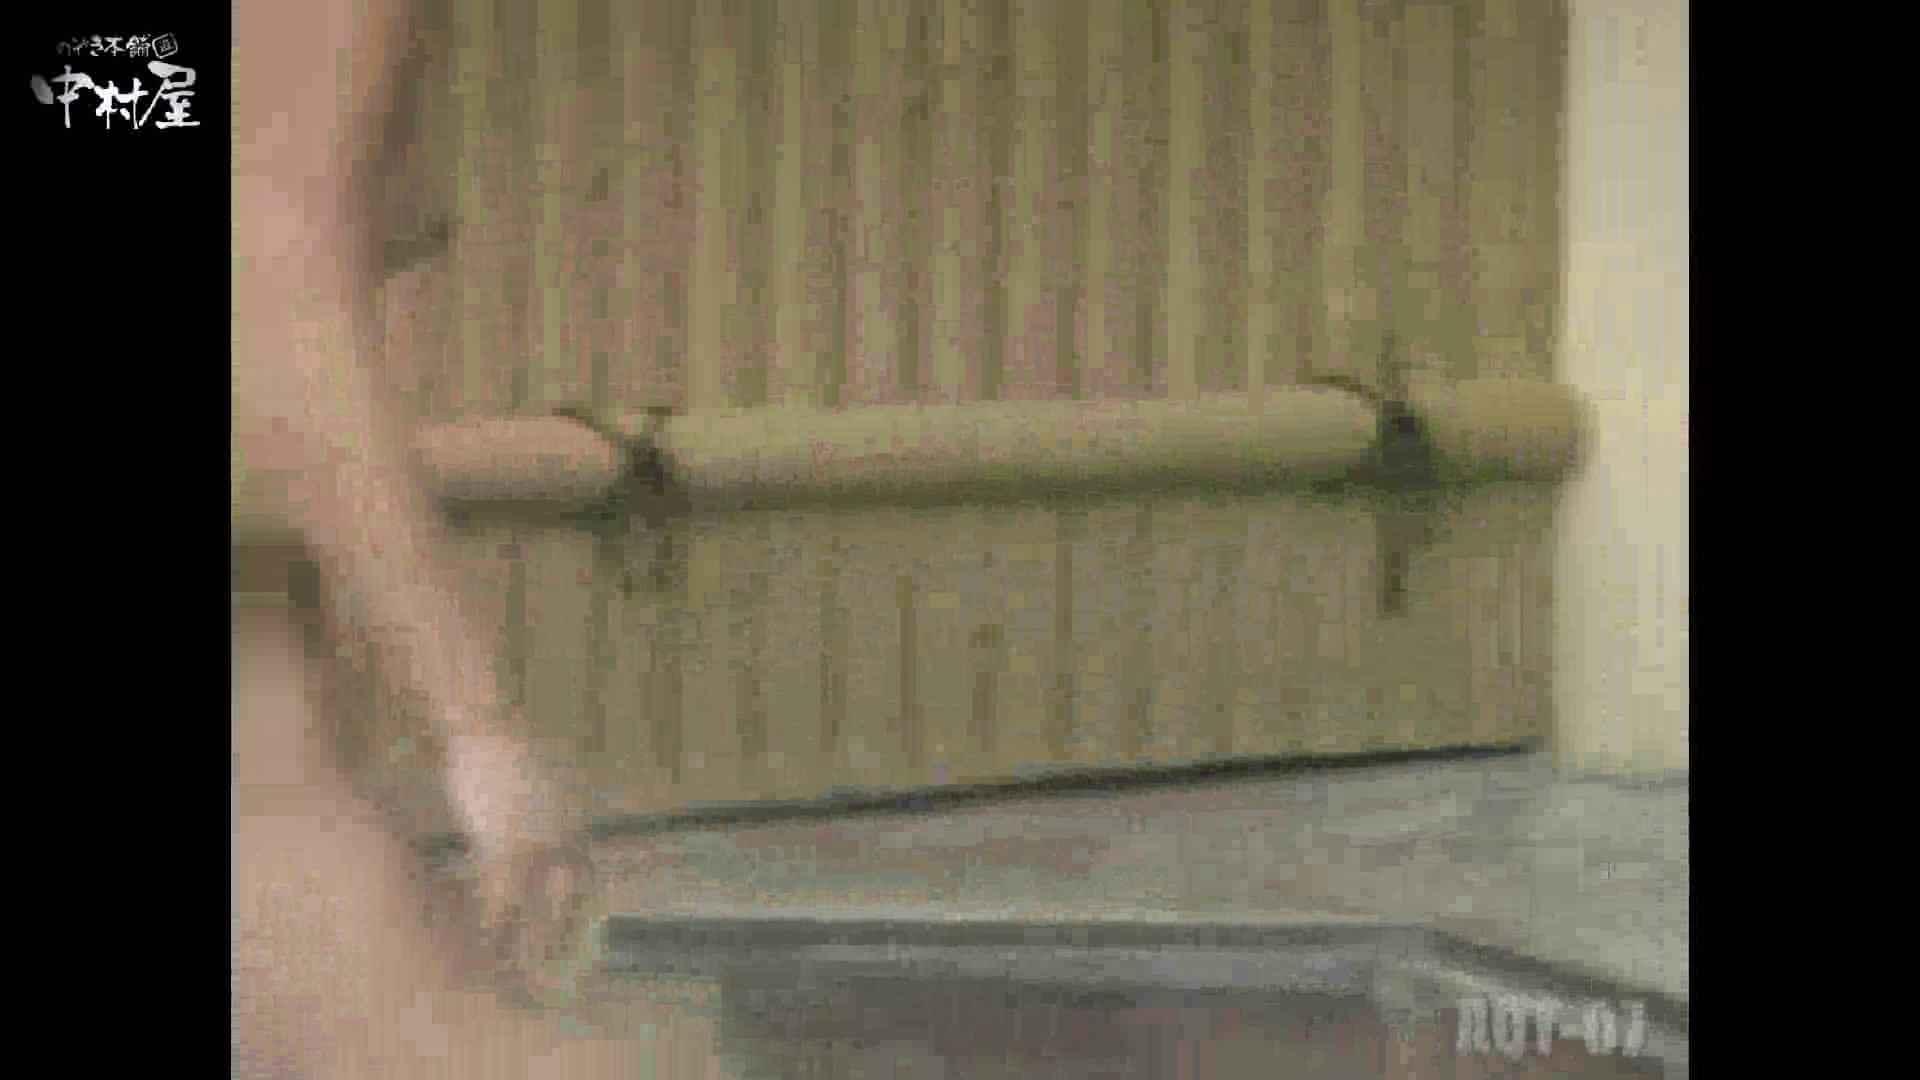 Aquaな露天風呂Vol.871潜入盗撮露天風呂七判湯 其の五 露天 | 潜入シリーズ  68pic 67